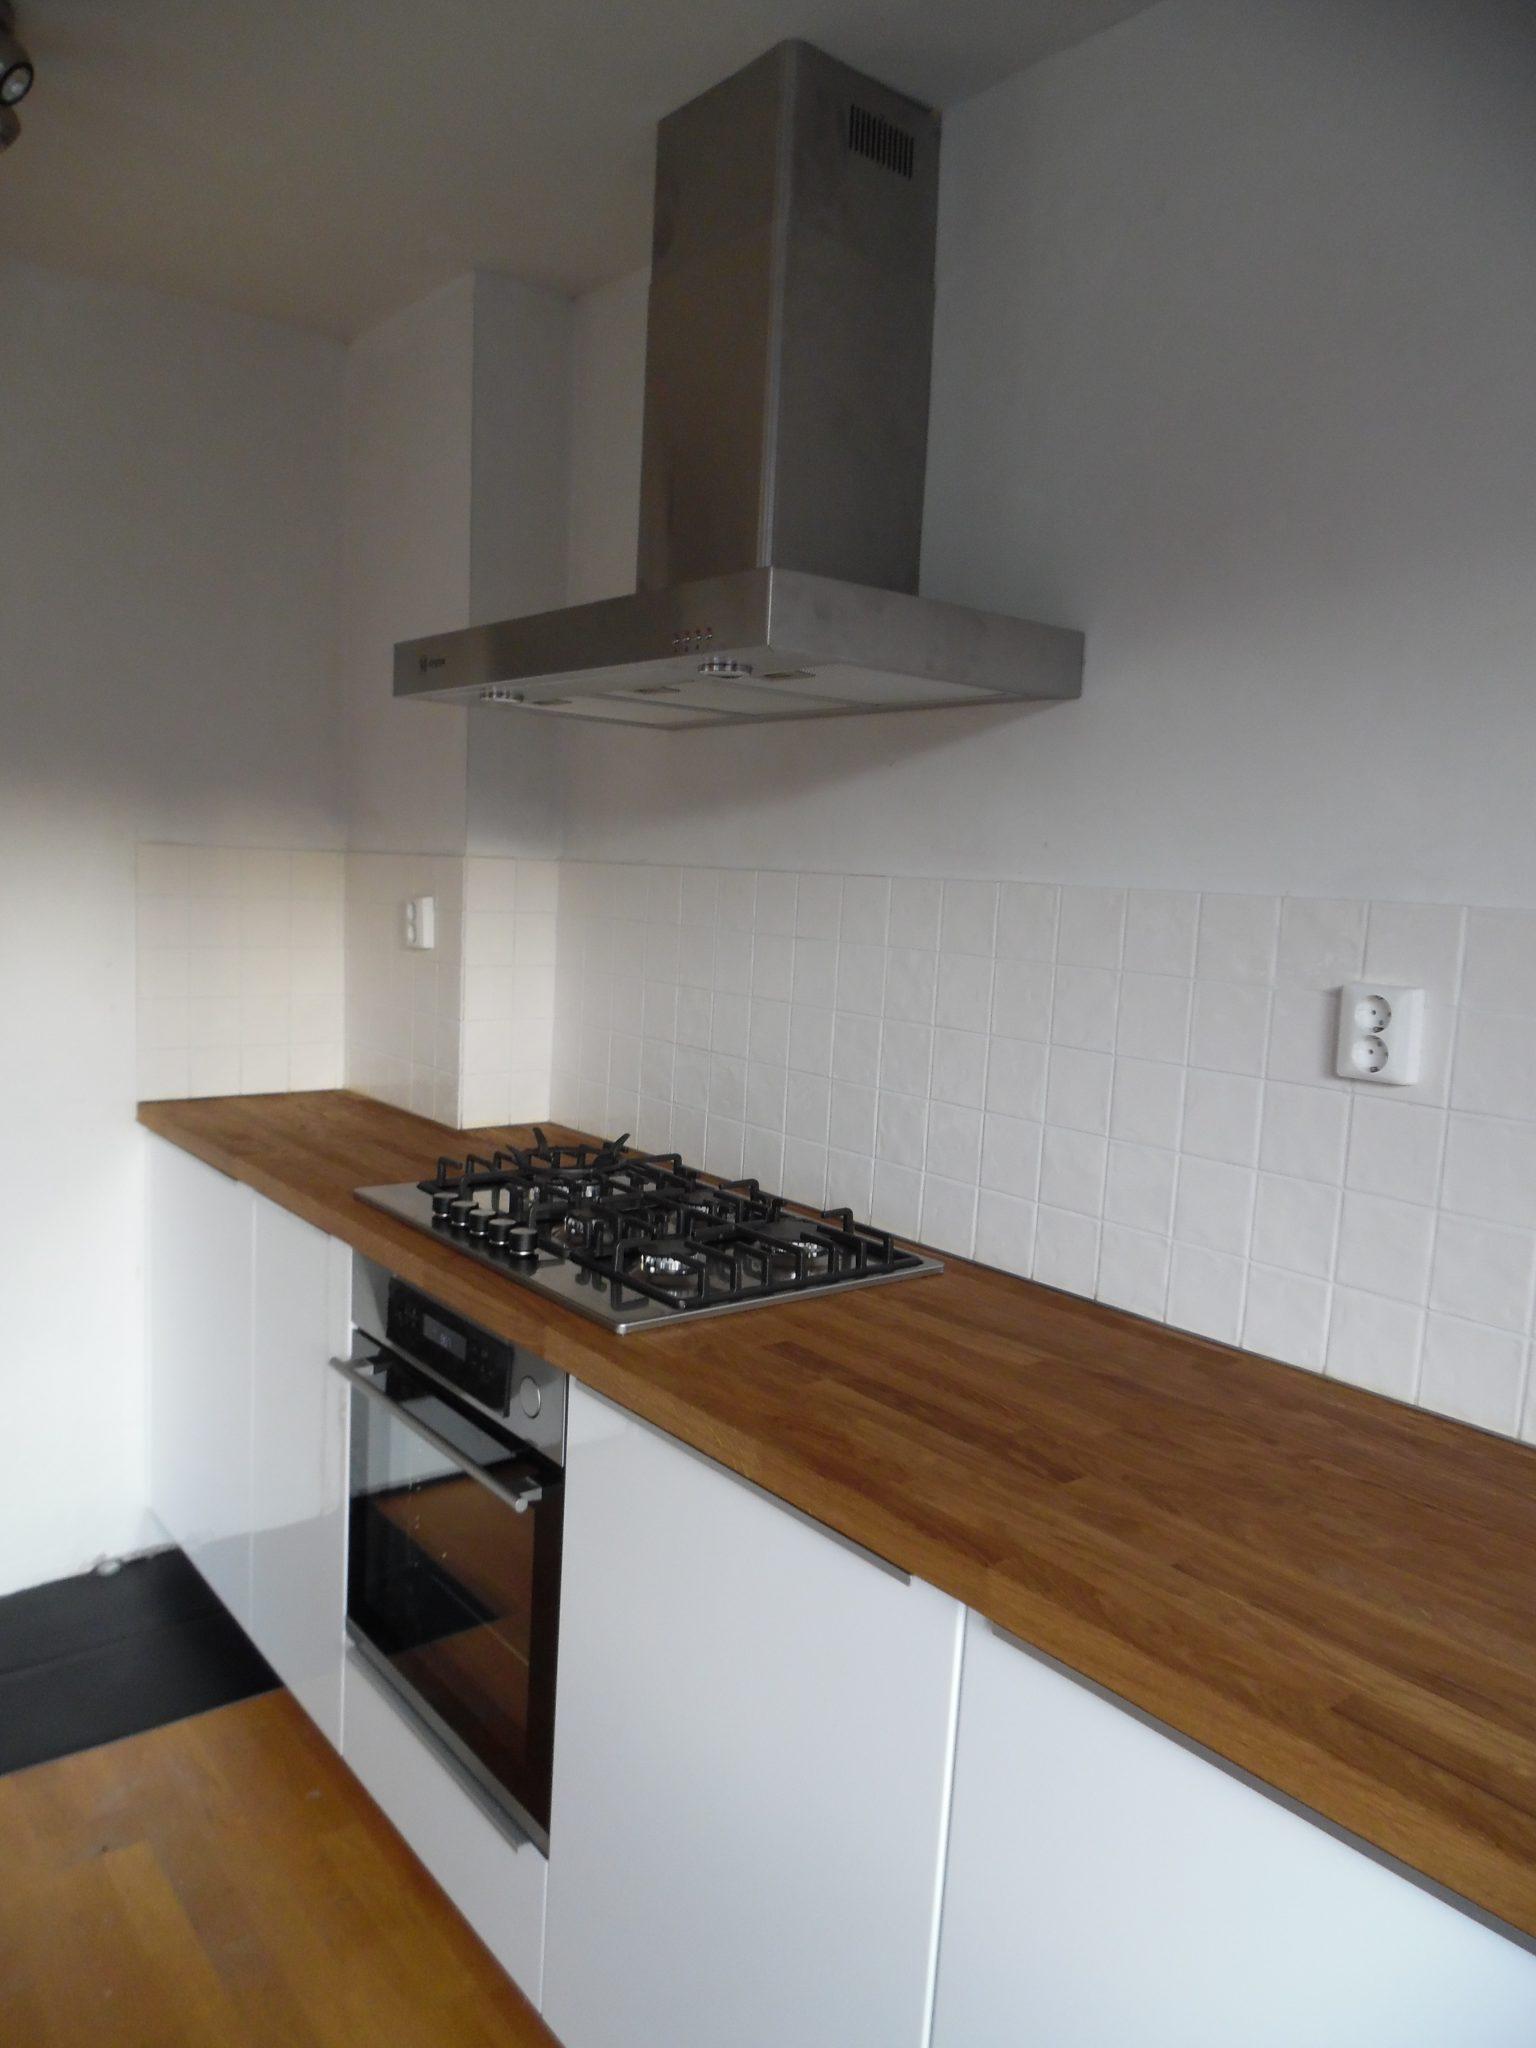 ikea keukenmontage incl tegelwerk rotterdam marco rietdijk keukenmontage. Black Bedroom Furniture Sets. Home Design Ideas